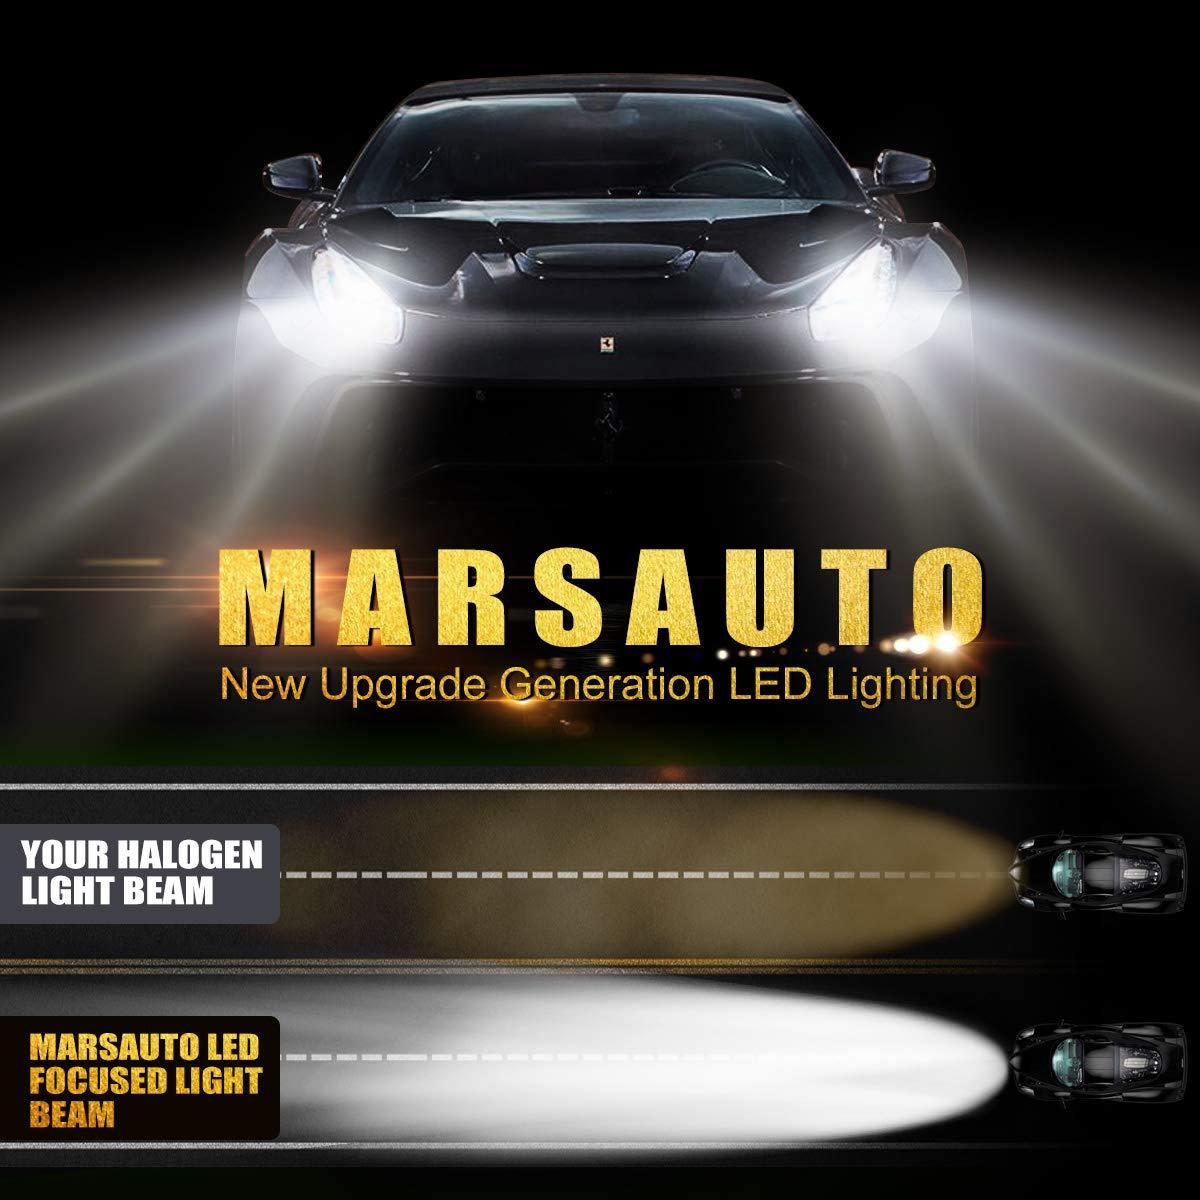 HB3 LED Headlight High Beam Fog Light Bulbs 6000K 8000LMs Cool White Halogen Replacement 2 Pack Marsauto 9005 LED Headlights